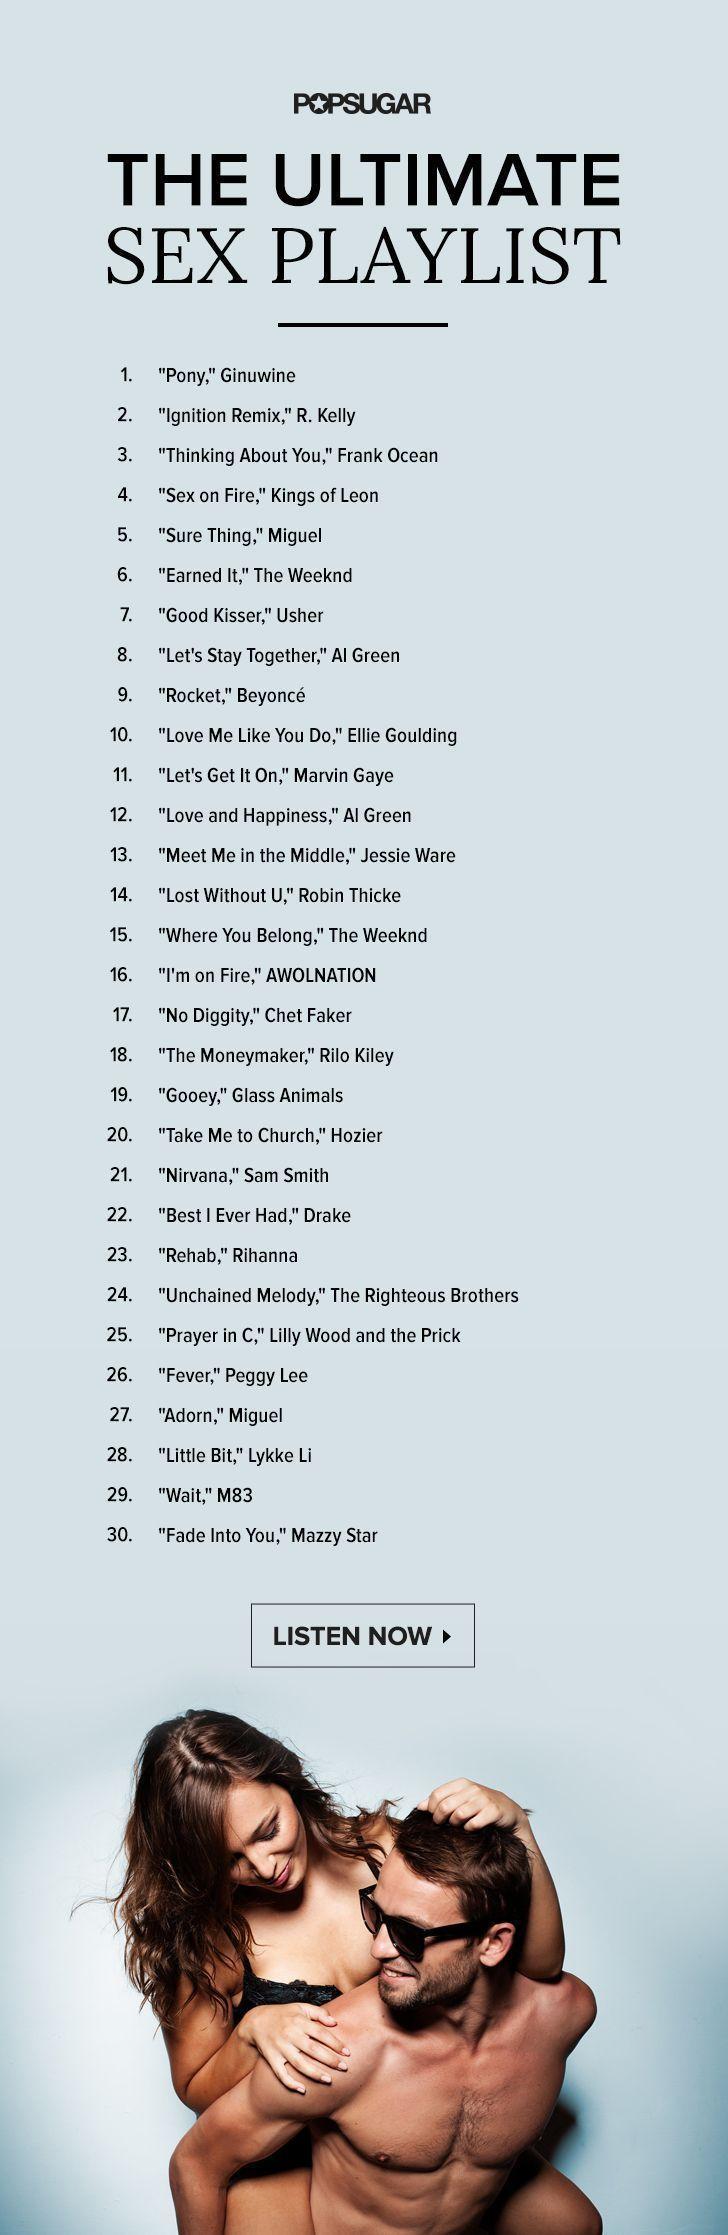 533 best Music images on Pinterest   Playlists, Music lyrics and Lyrics